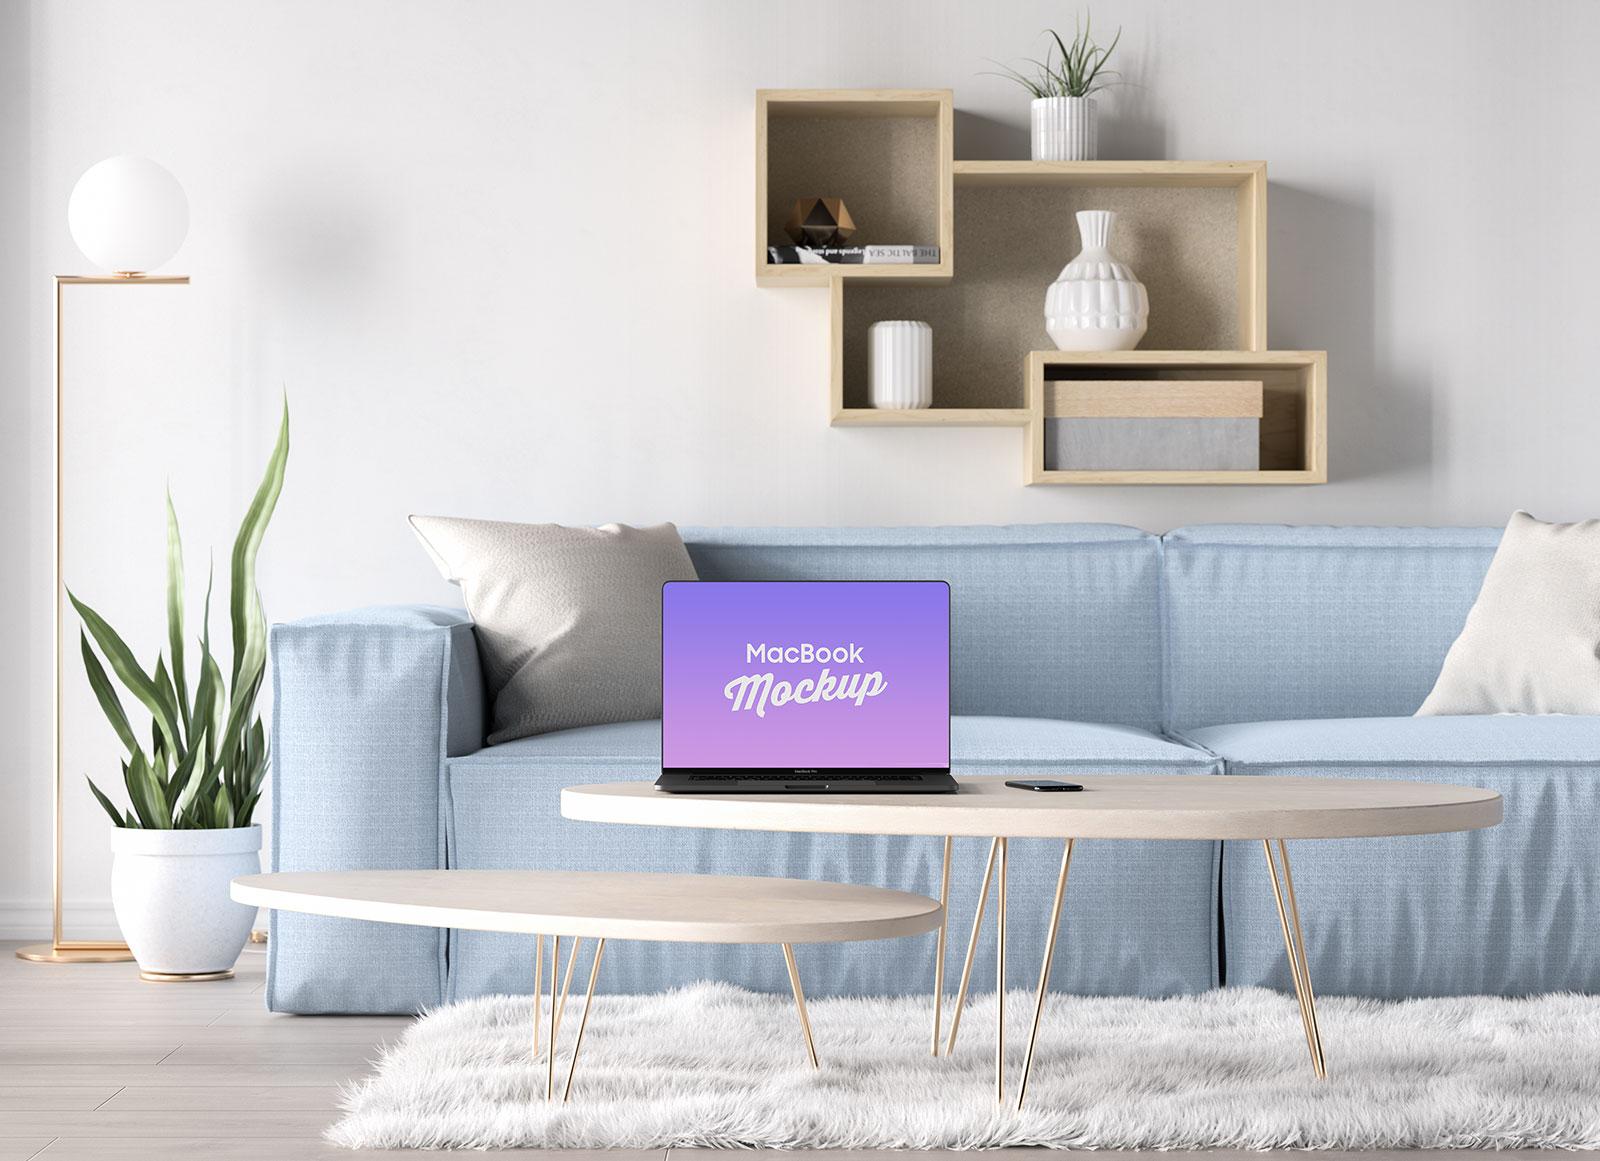 Free-Bezel-Less-MacBook-Pro-2019-in-Table-Mockup-PSD